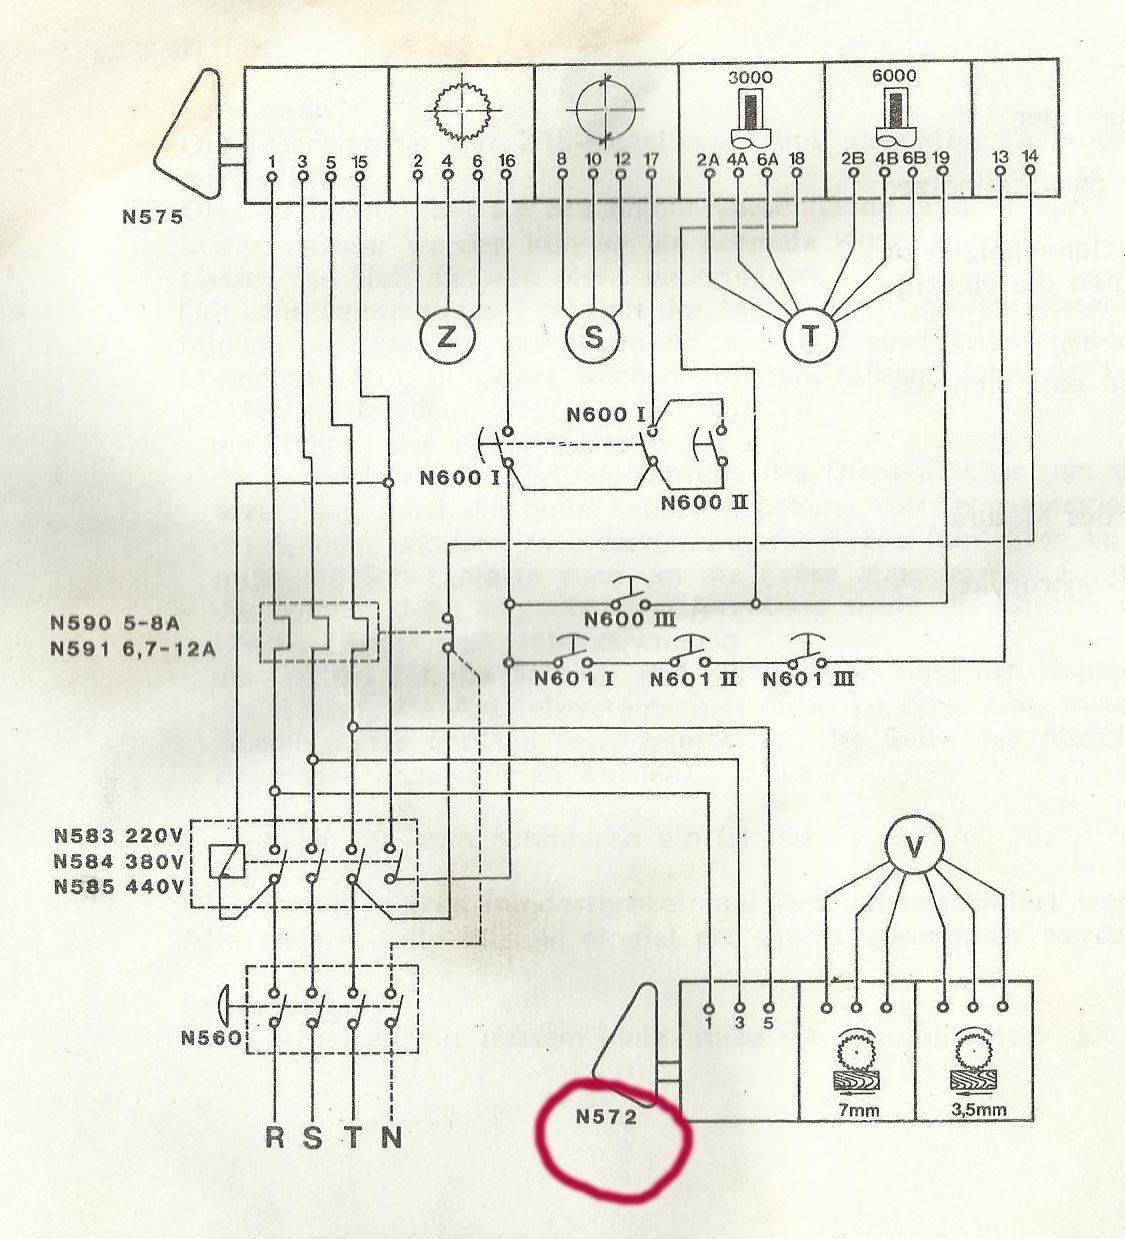 Schema elec 01 - Robland K310.jpg